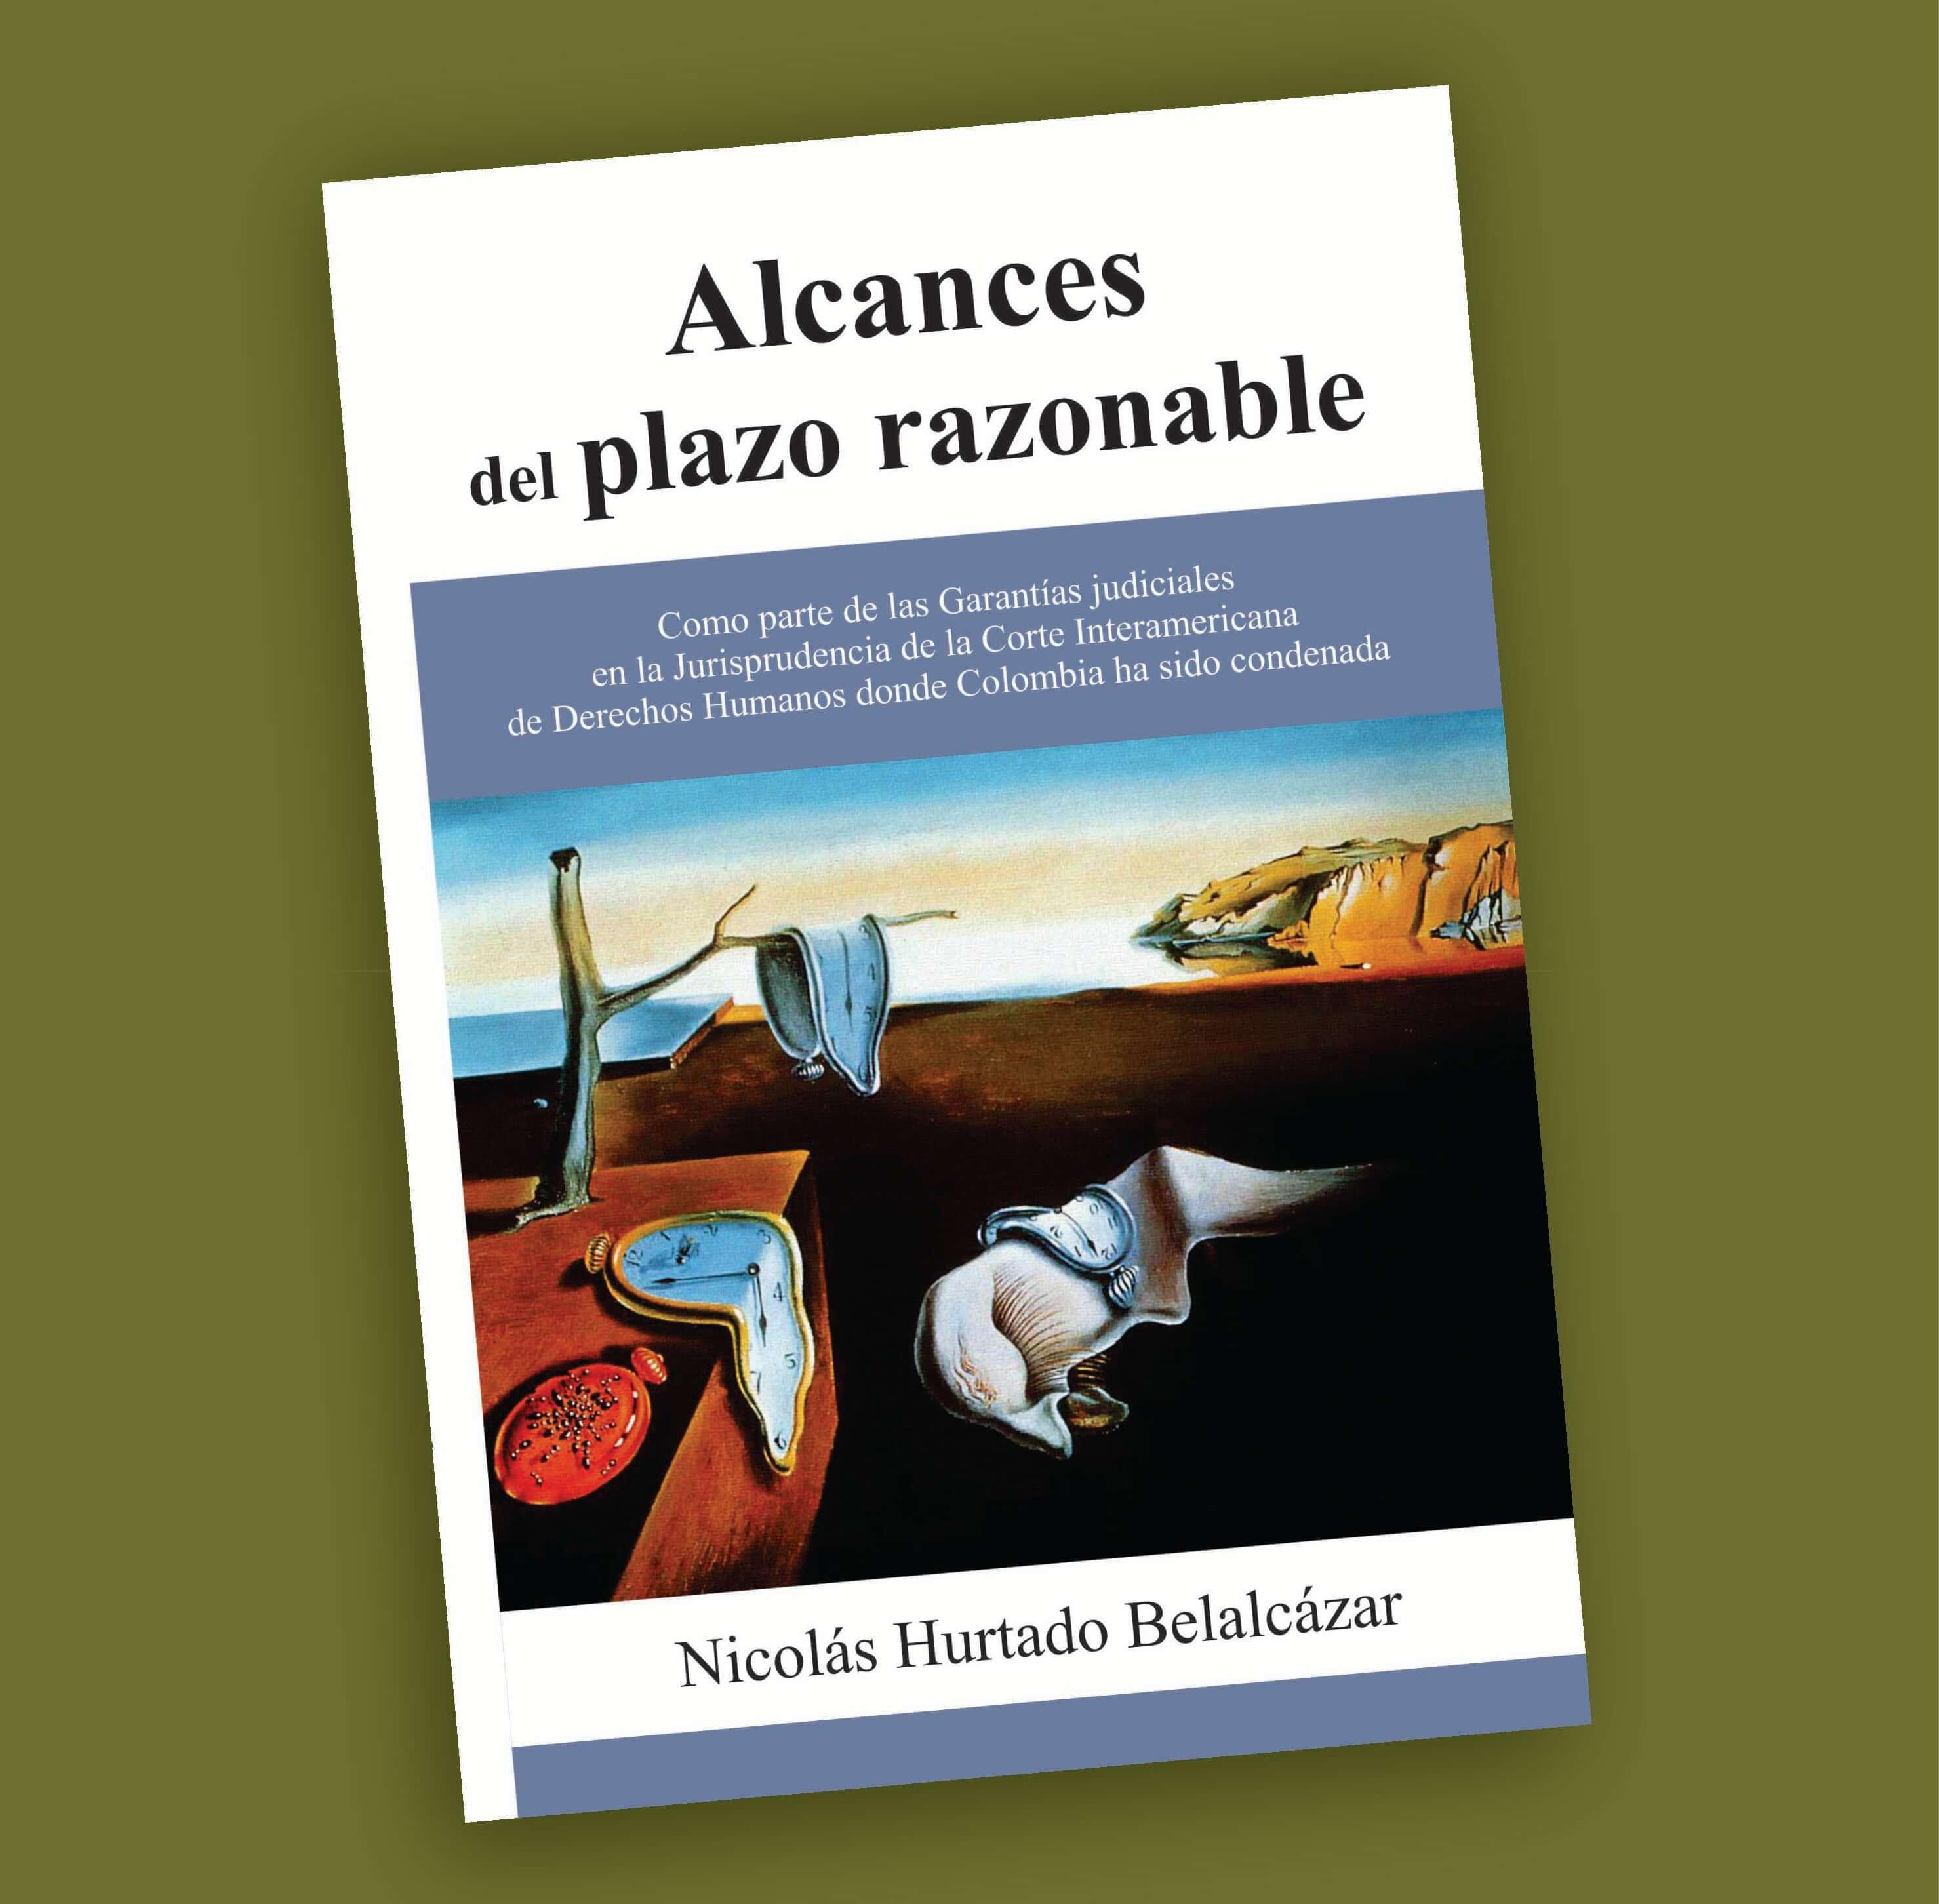 Alcances del plazo razonable-Nicolás Hurtado Belalcázar 1